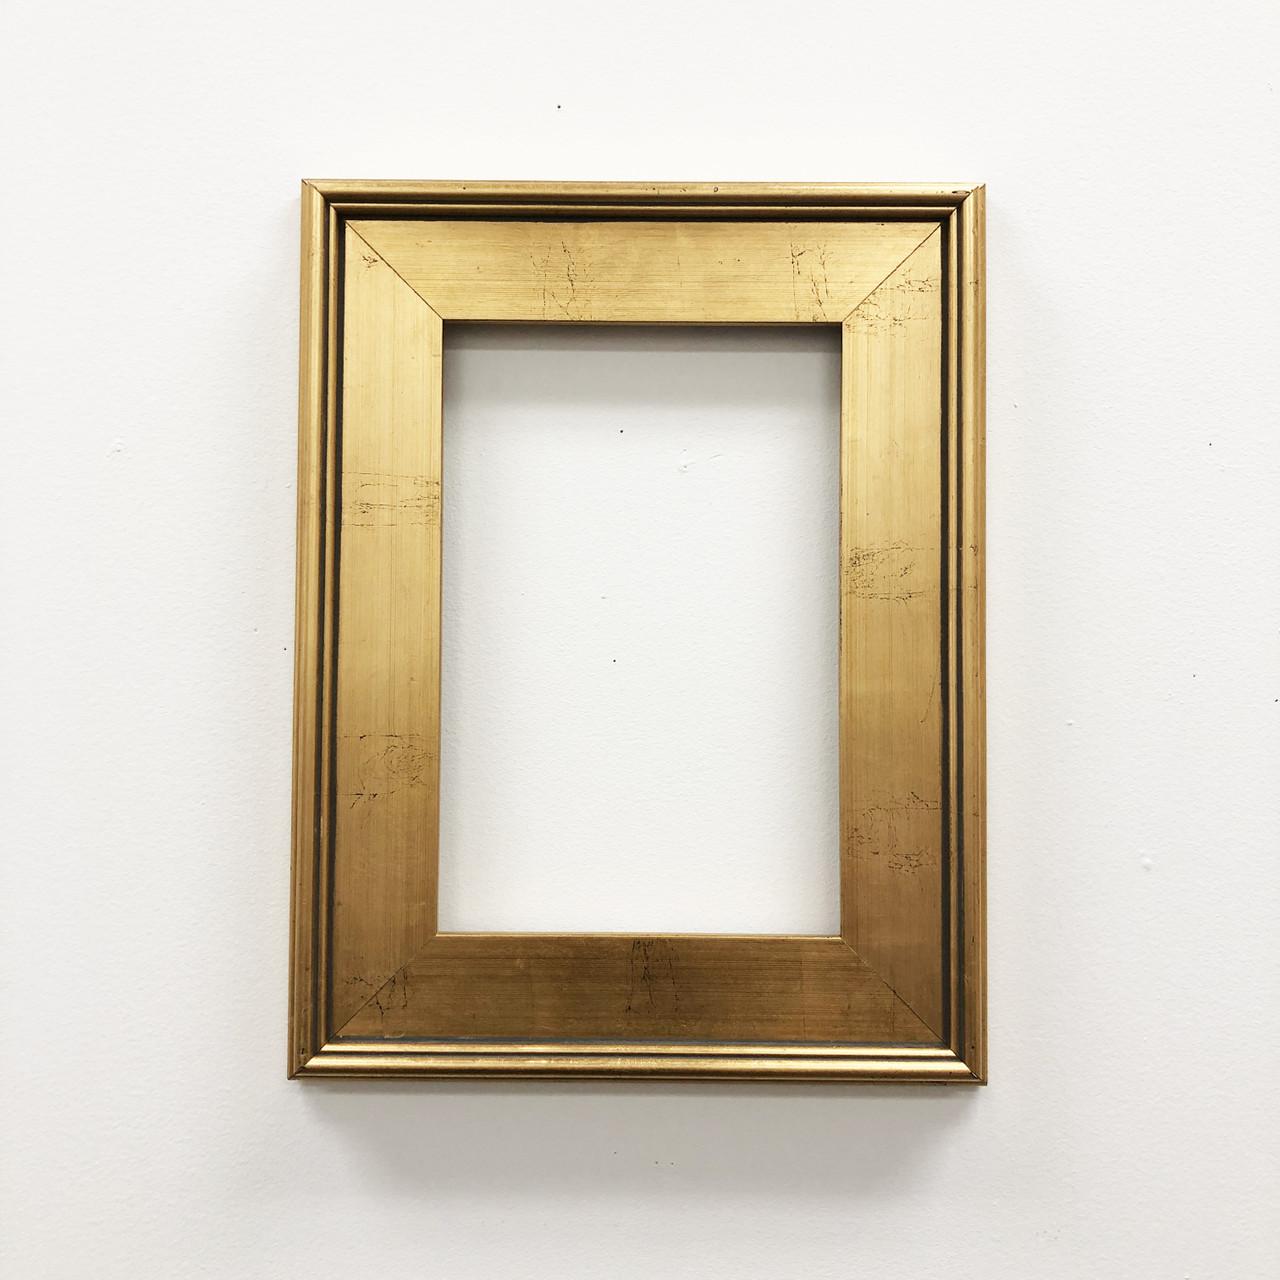 Picture Frames & Hanging Hardware